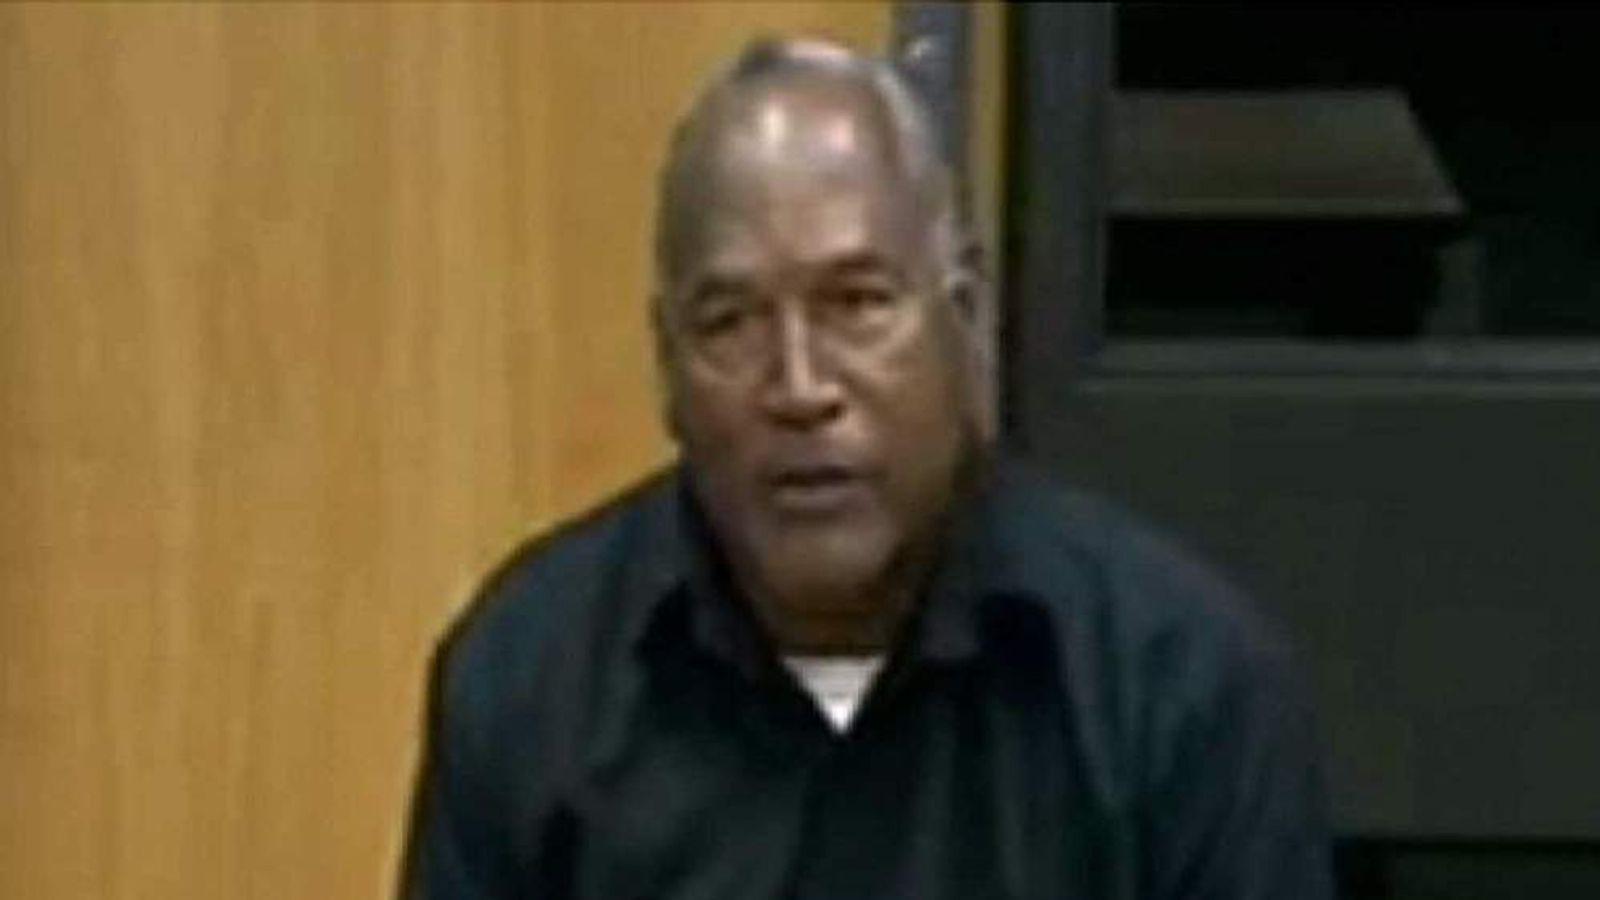 OJ Simpson appears at a parole board hearing